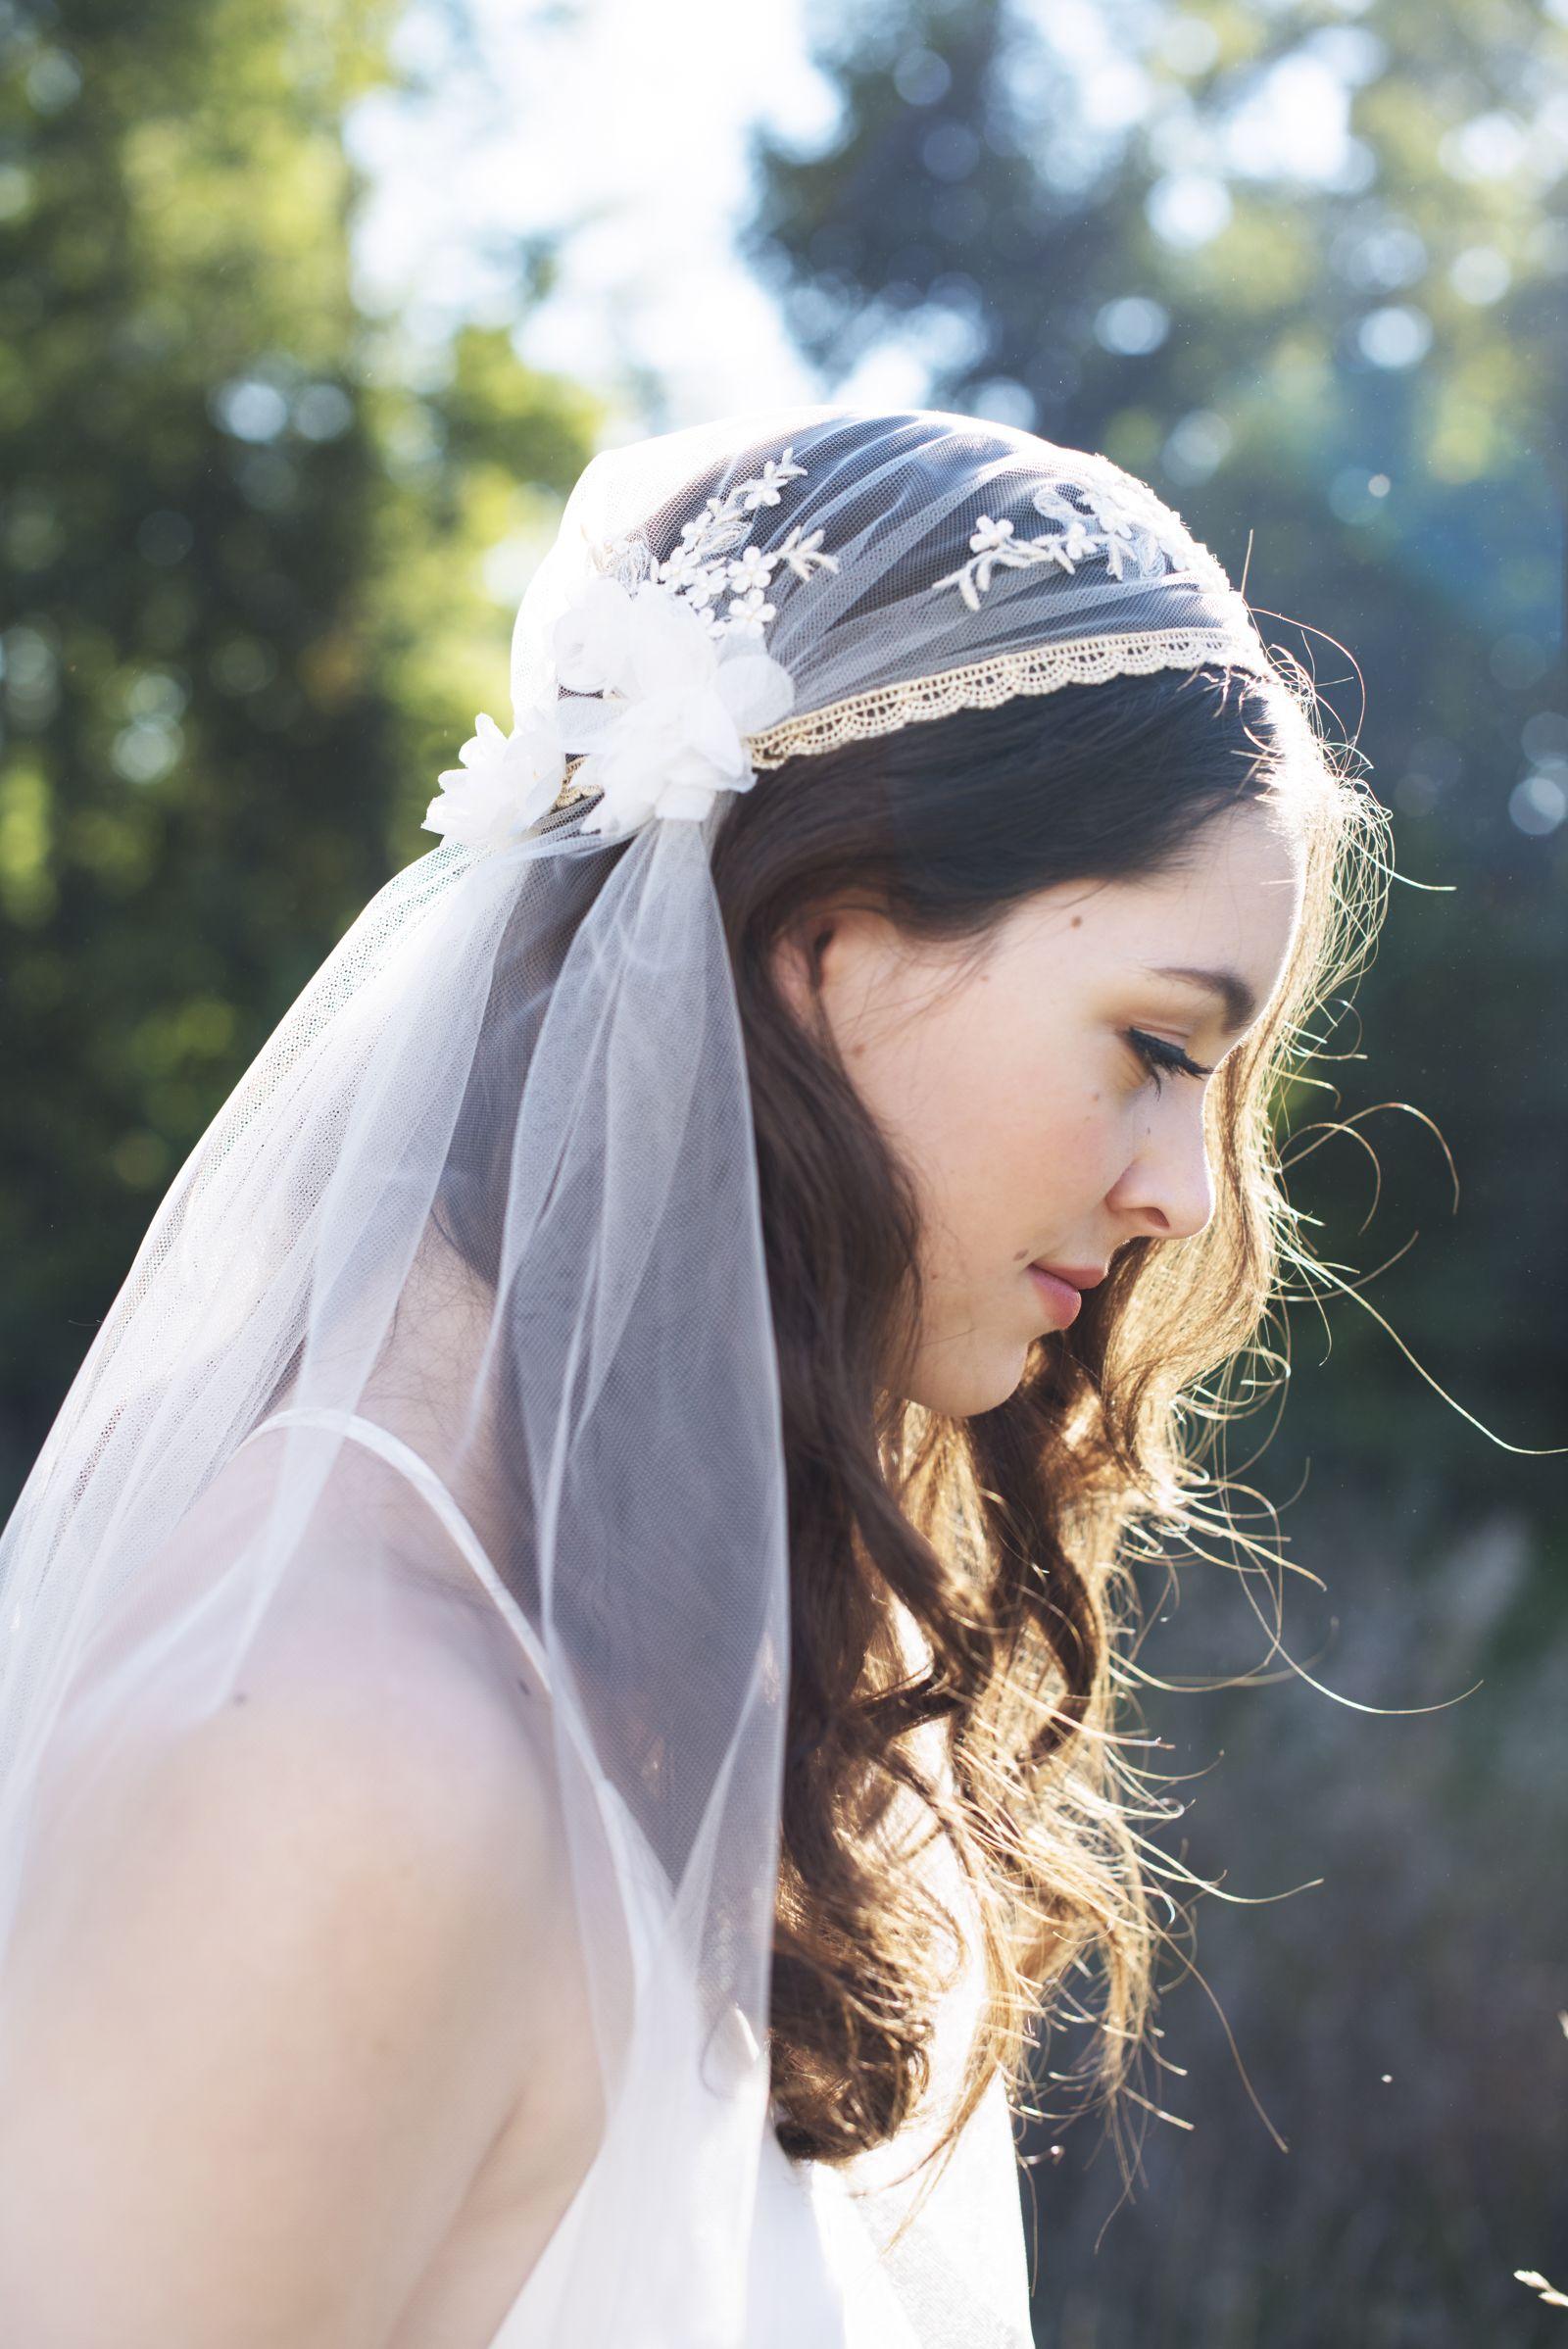 bridal beauty shoot for blair nadeau millinery 2015 catalogue model